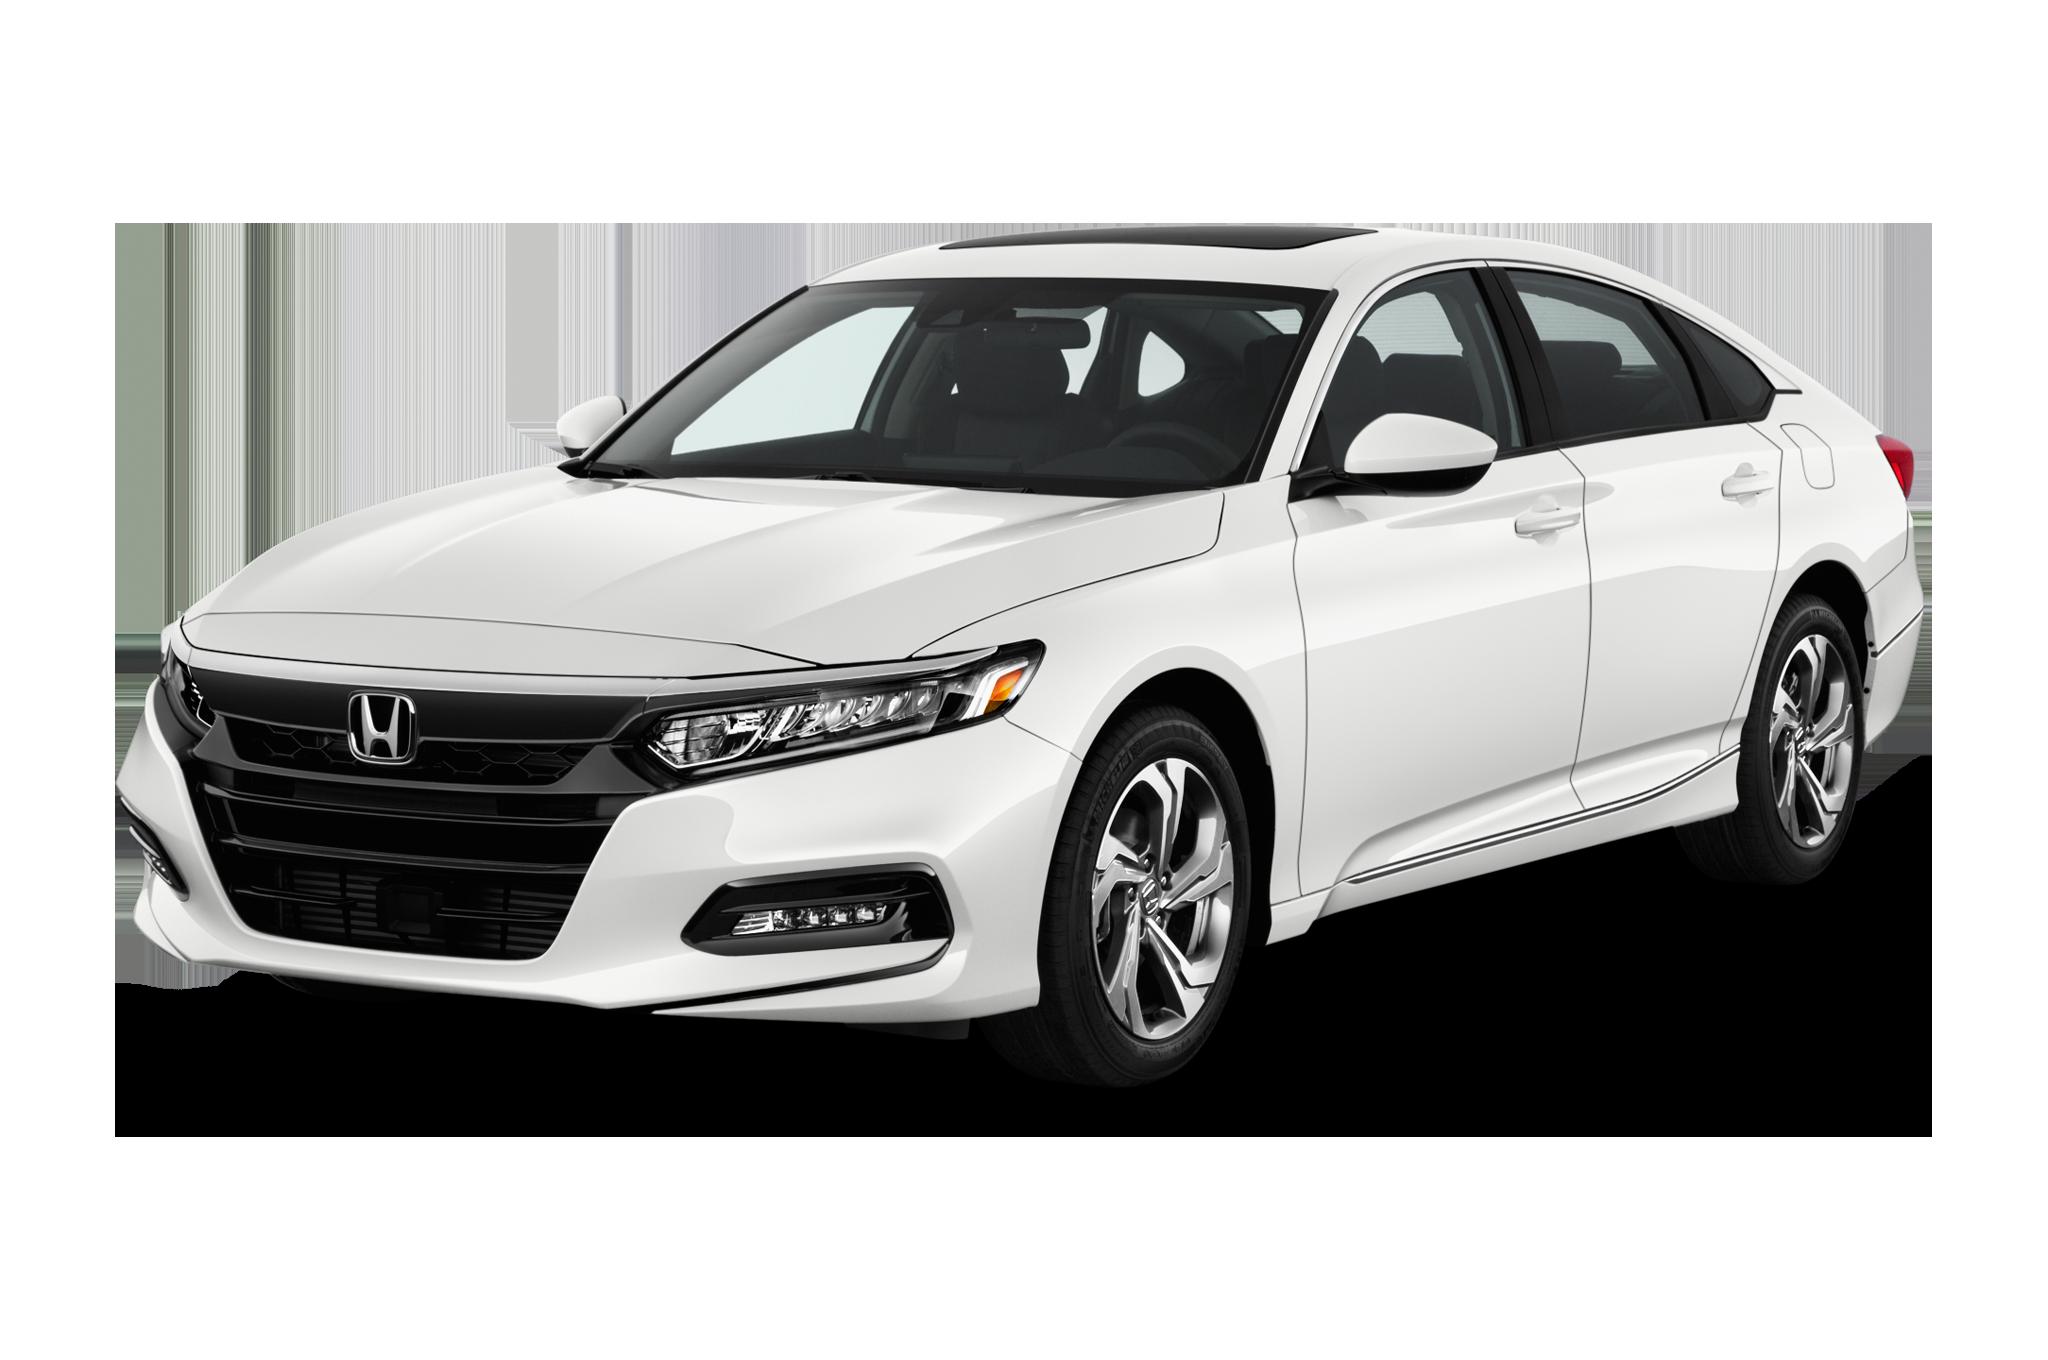 Honda Civic Lx Vs Ex >> 2019 Honda Accord Overview - MSN Autos